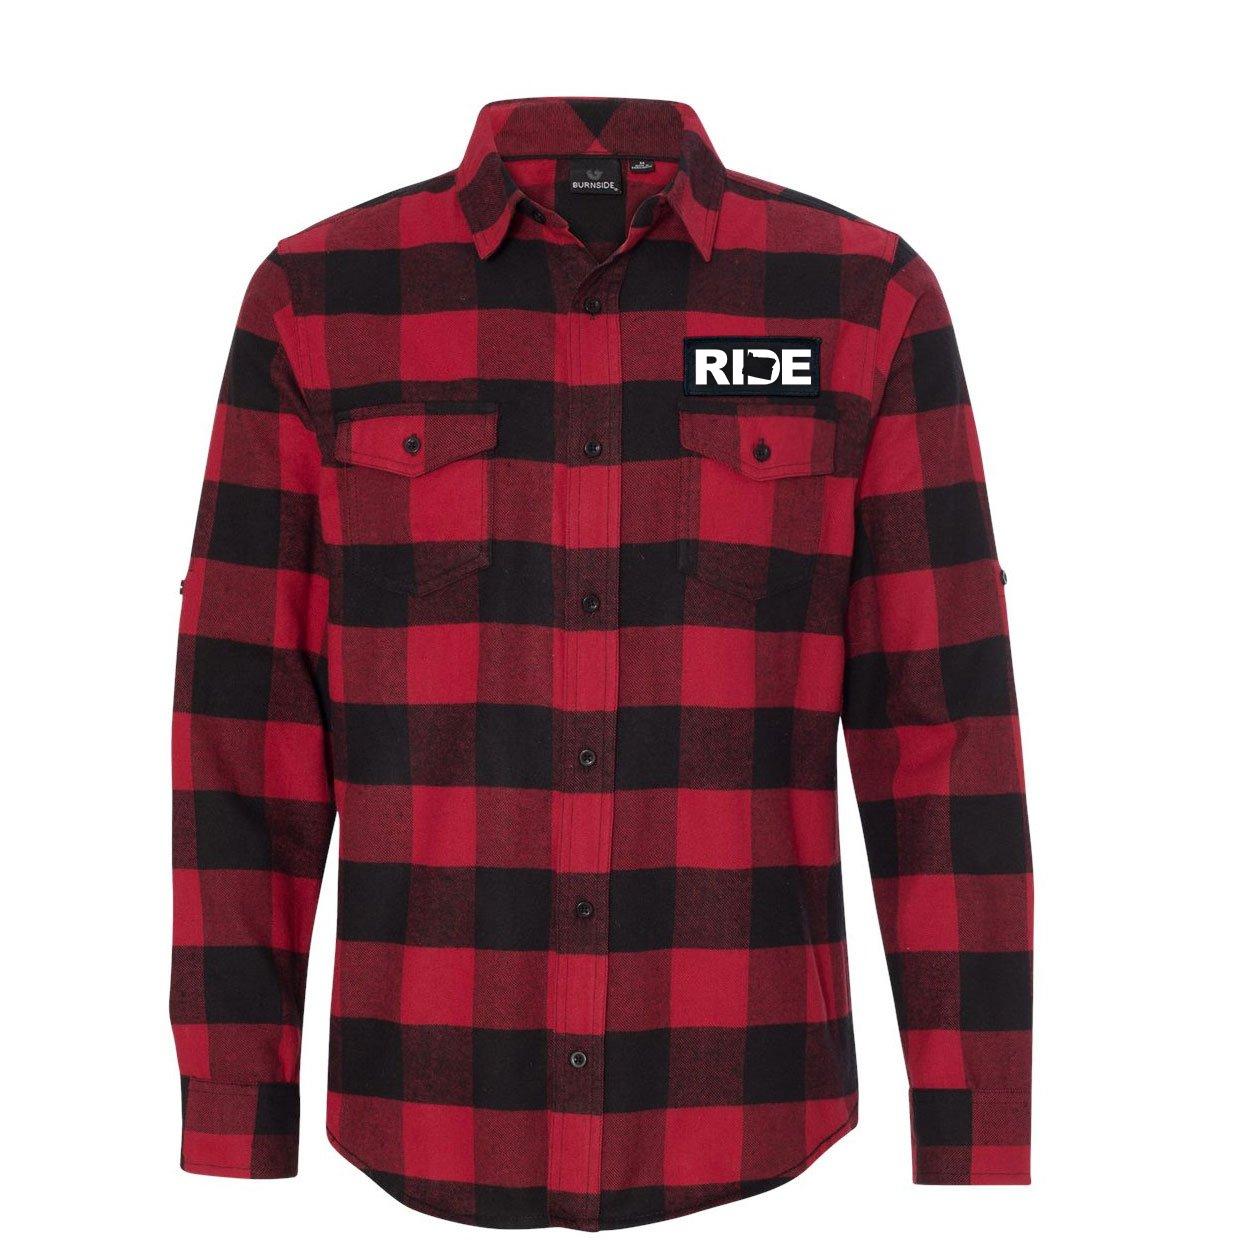 Ride Oregon Classic Unisex Long Sleeve Woven Patch Flannel Shirt Red/Black Buffalo (White Logo)